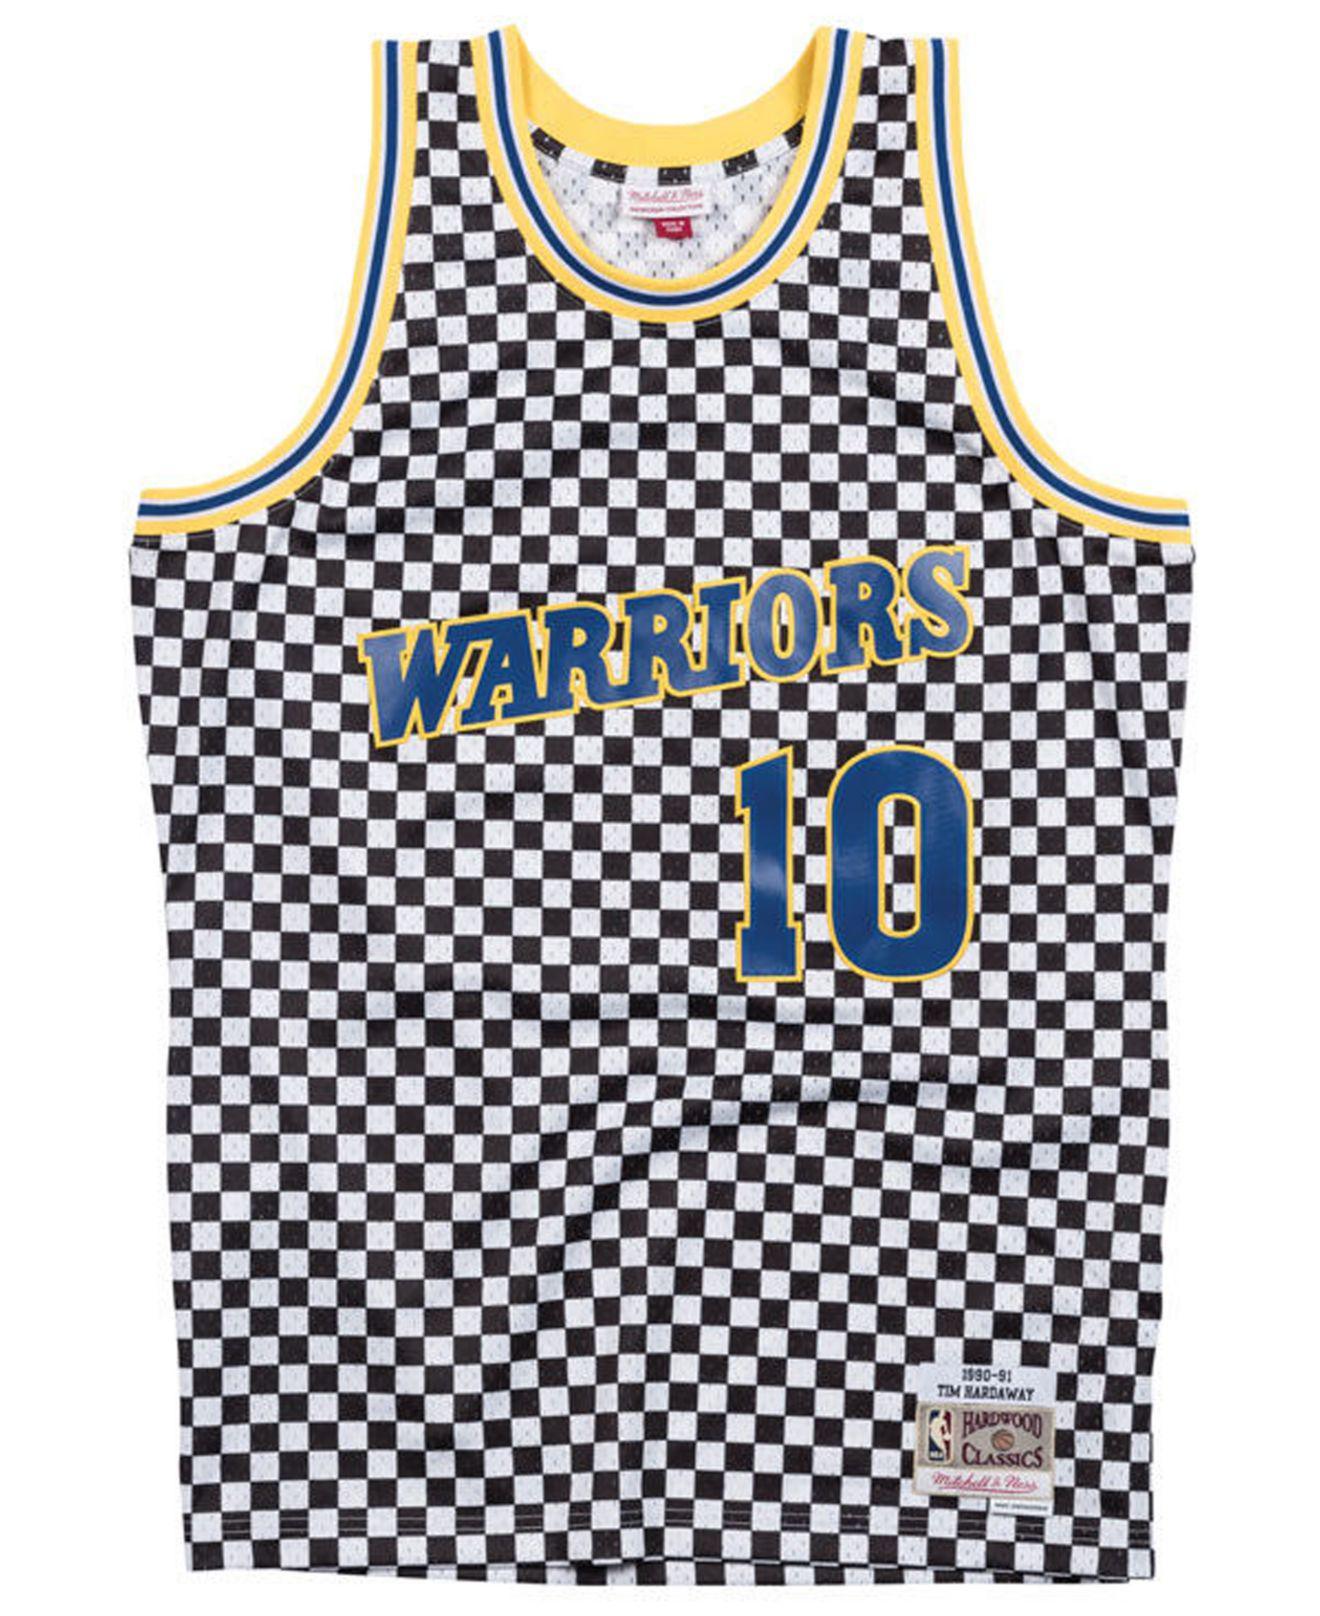 fd77ca03b9c Mitchell & Ness - Multicolor Tim Hardaway Golden State Warriors  Checkerboard Swingman Jersey for Men -. View fullscreen